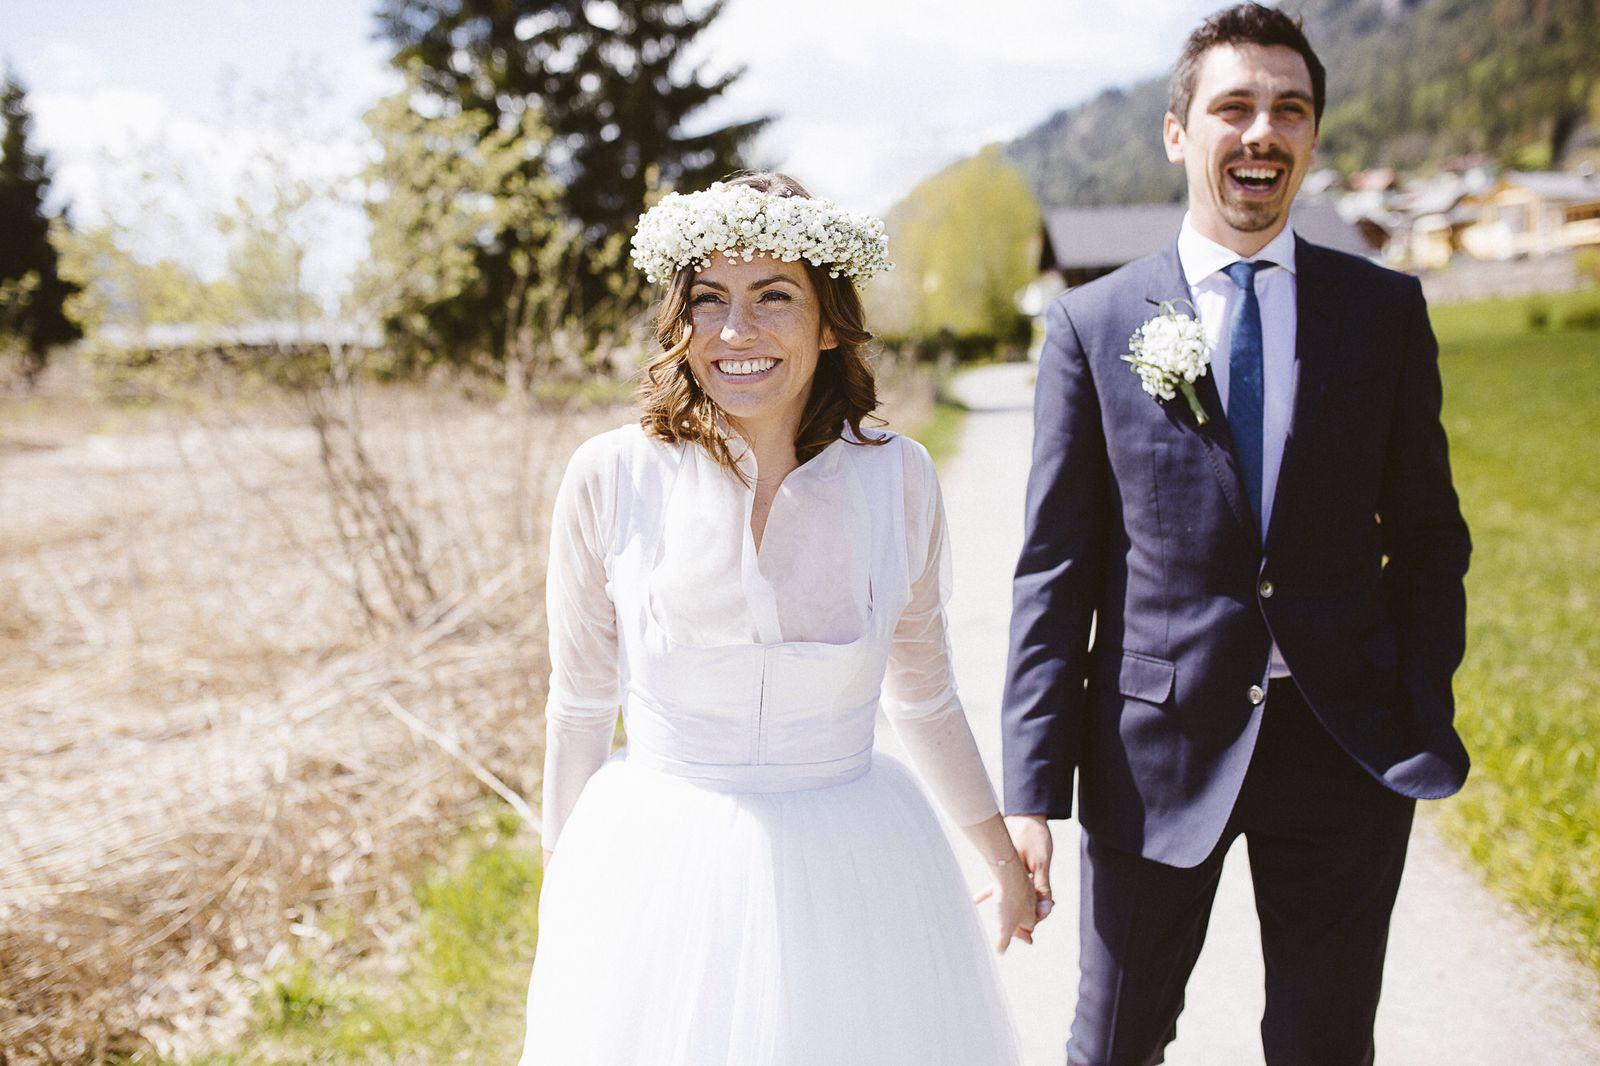 Tanja Hochzeit.jpg